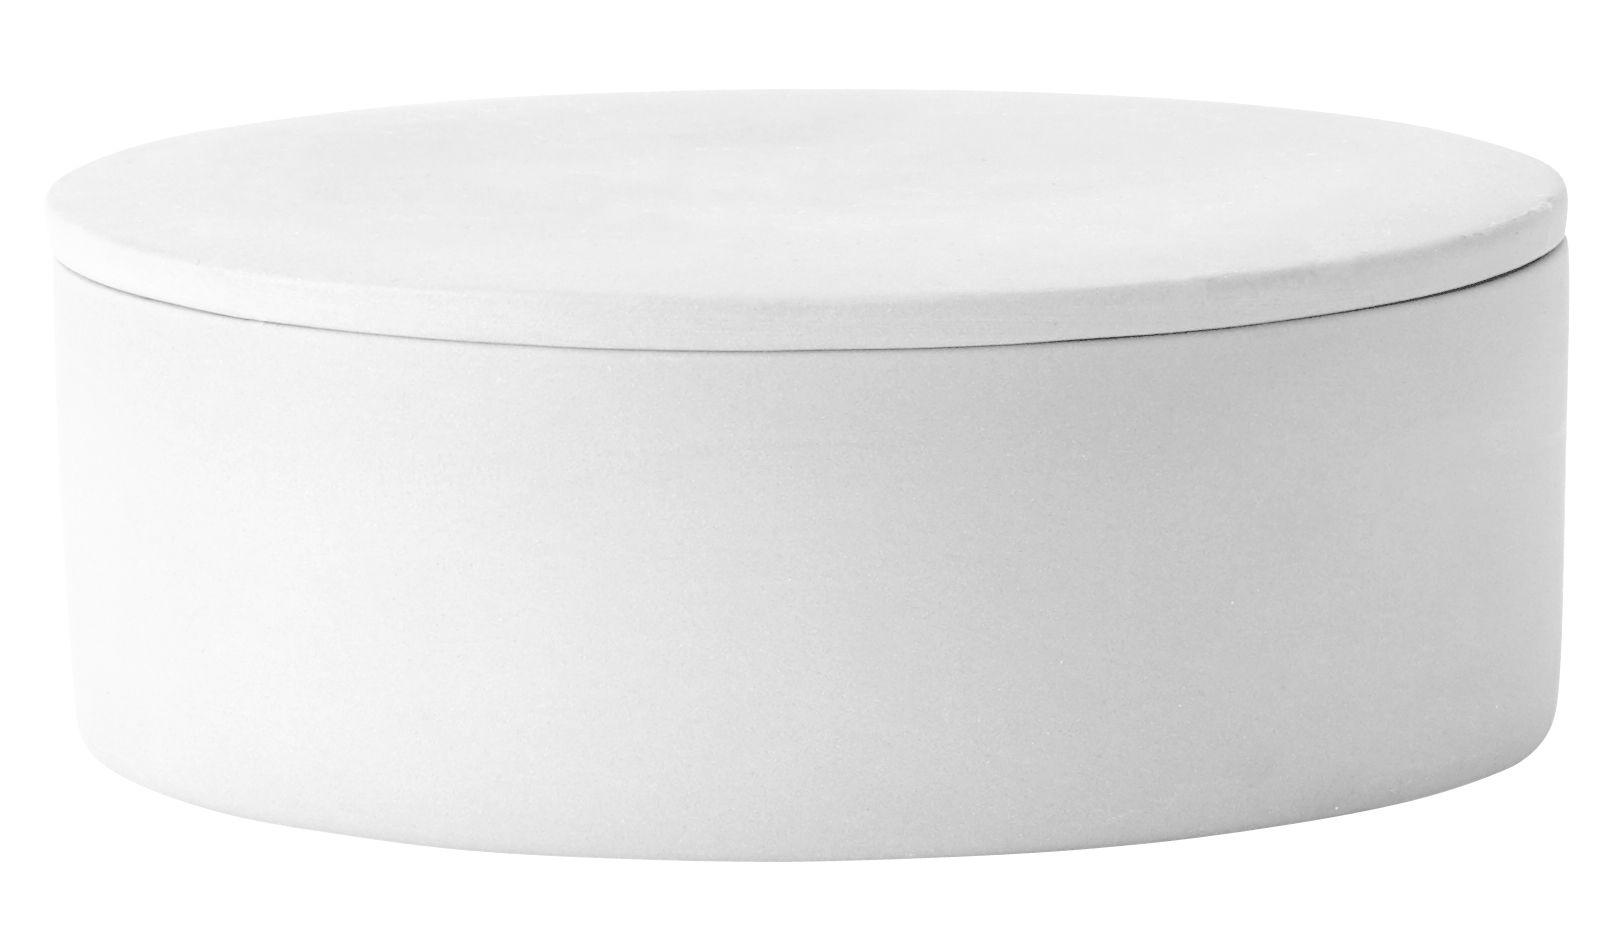 Interni - Vasi - Coperchio / Per vaso Cylindrical Large - Ø 12 cm - Menu - Coperchio / Bianco - Argilla